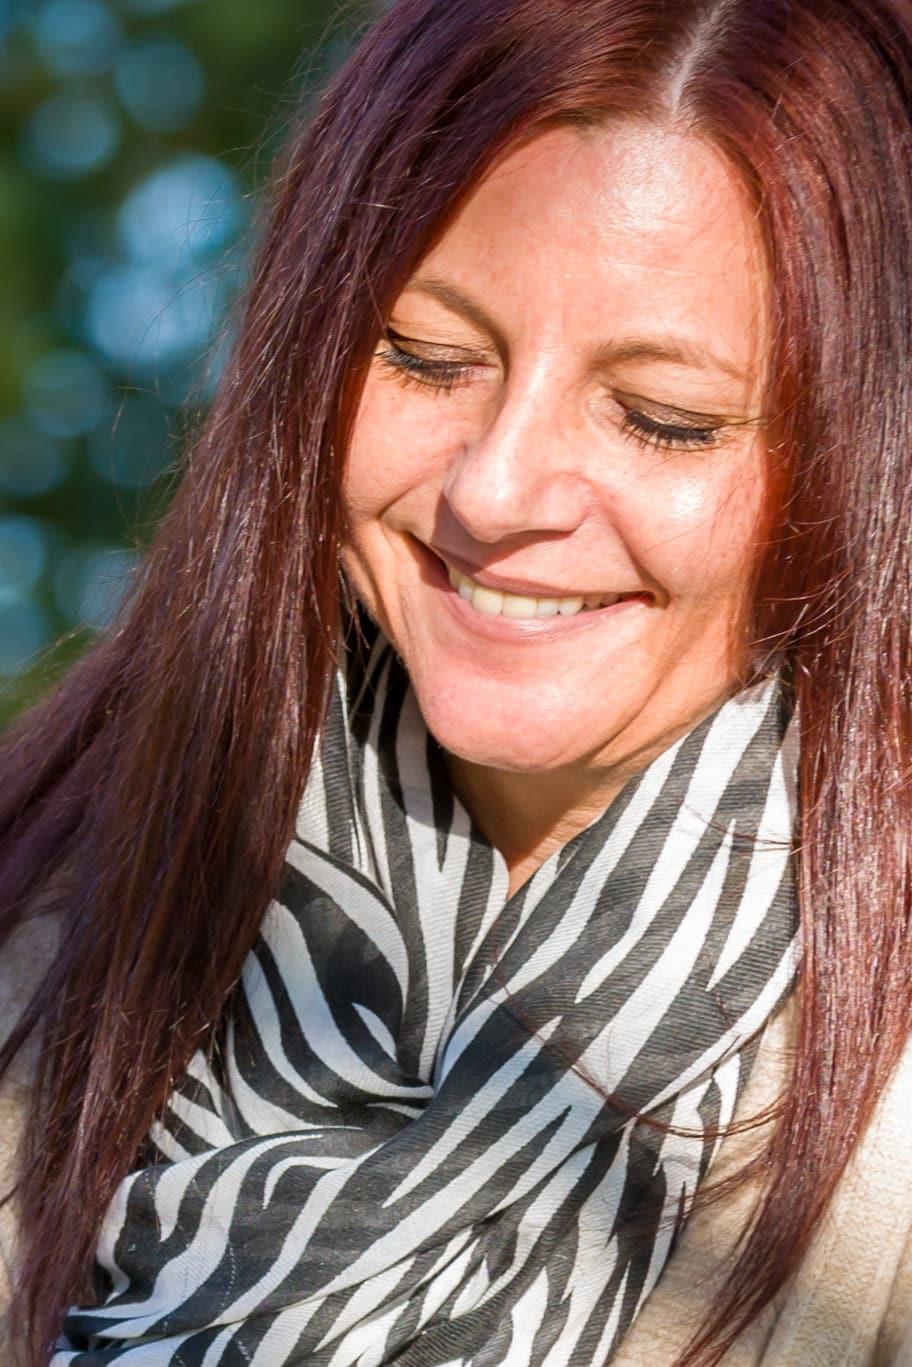 Patrica Guenoun coach thérapeute à Nice